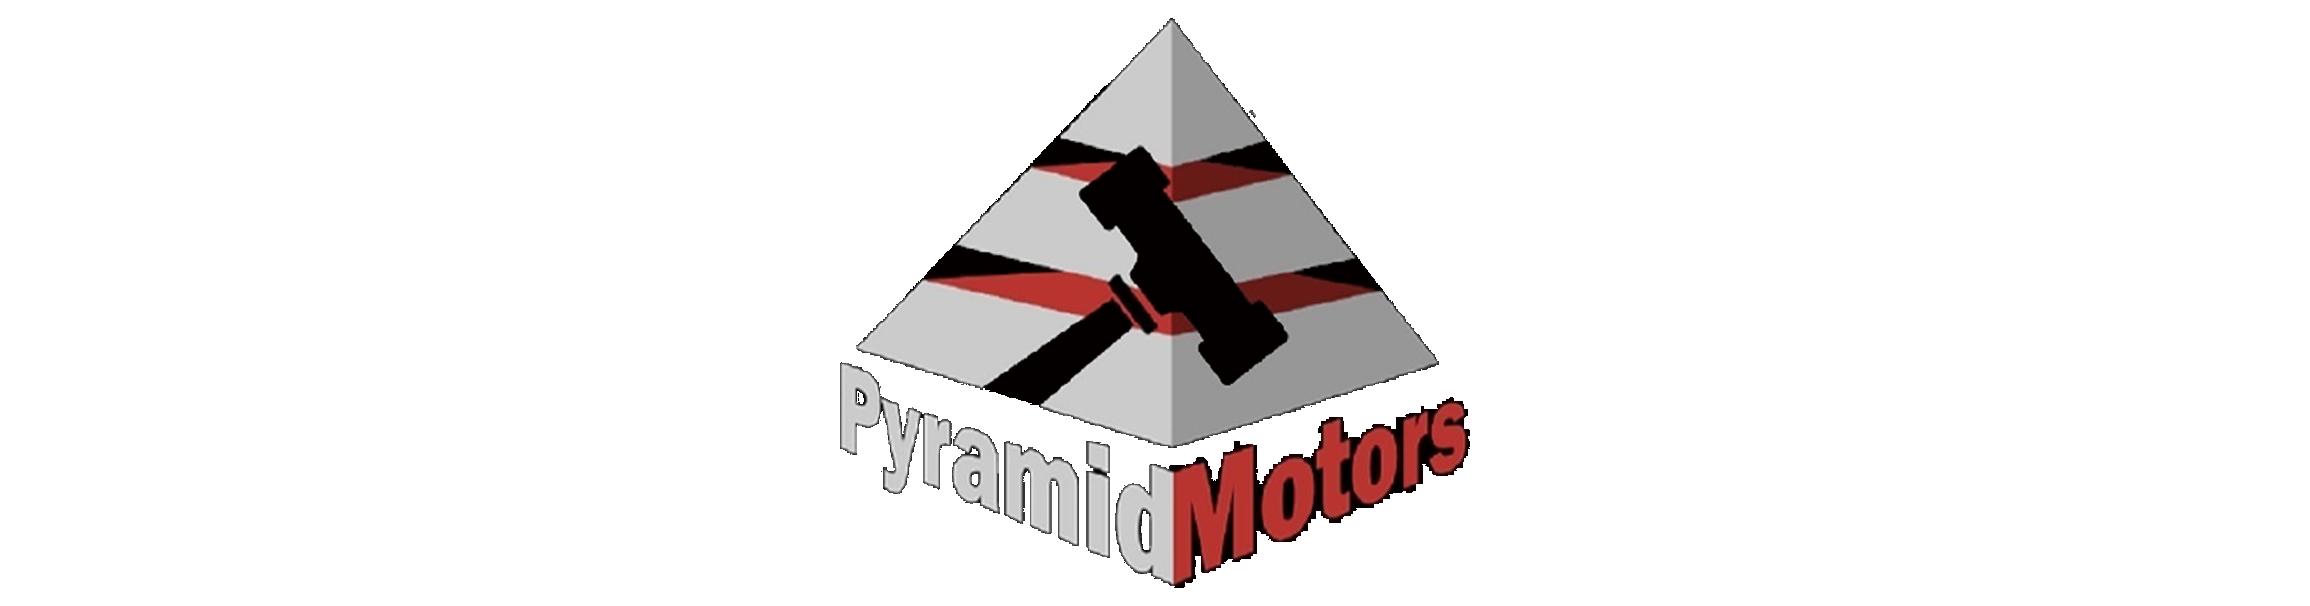 PYRAMID MOTORS AUTO SALES